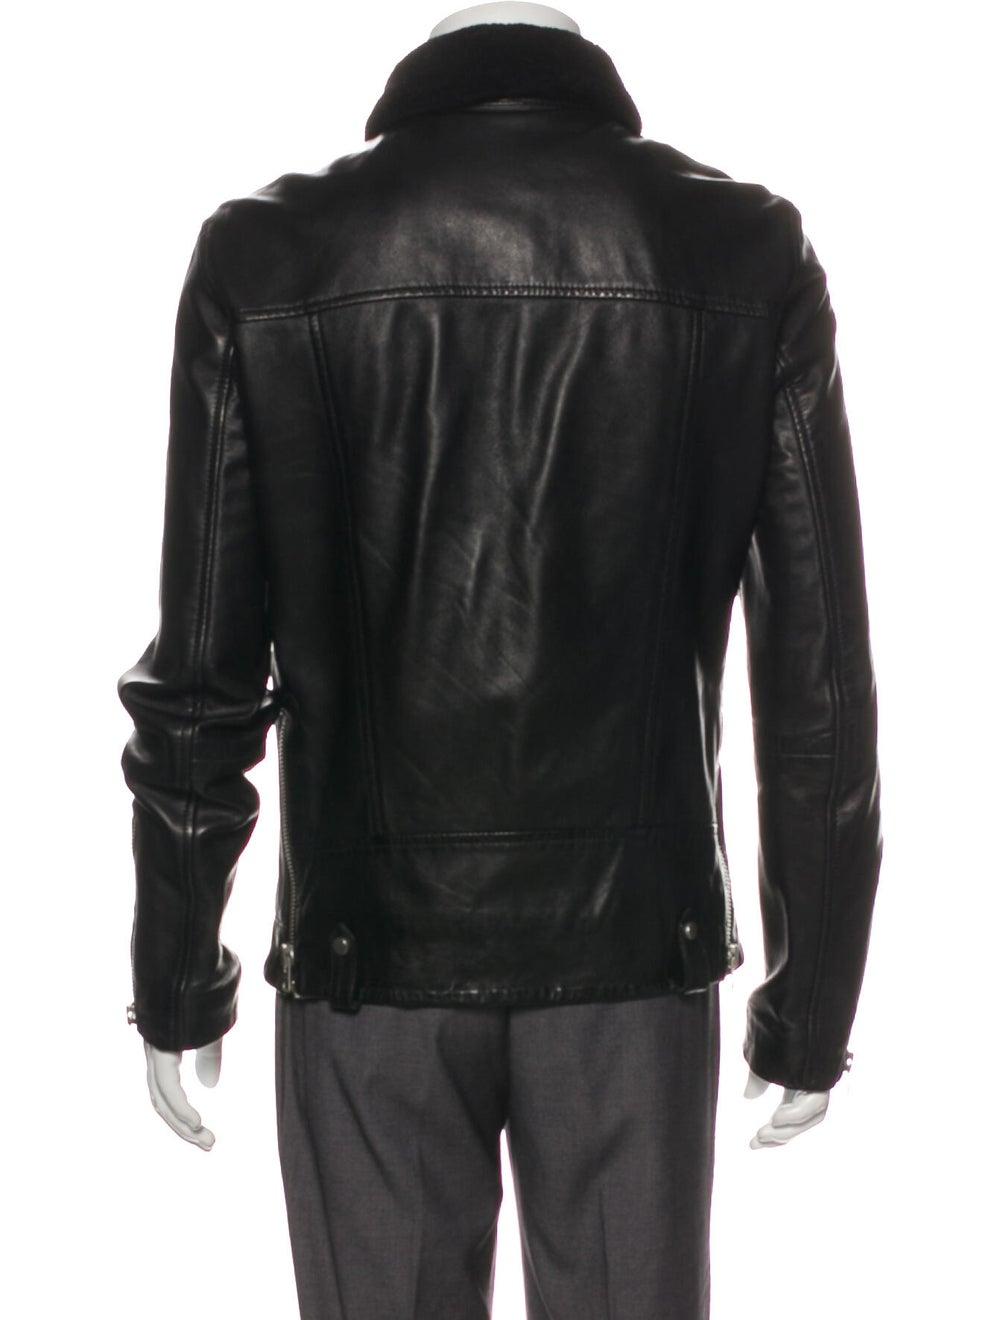 AllSaints Prospect Leather Moto Jacket Black - image 3